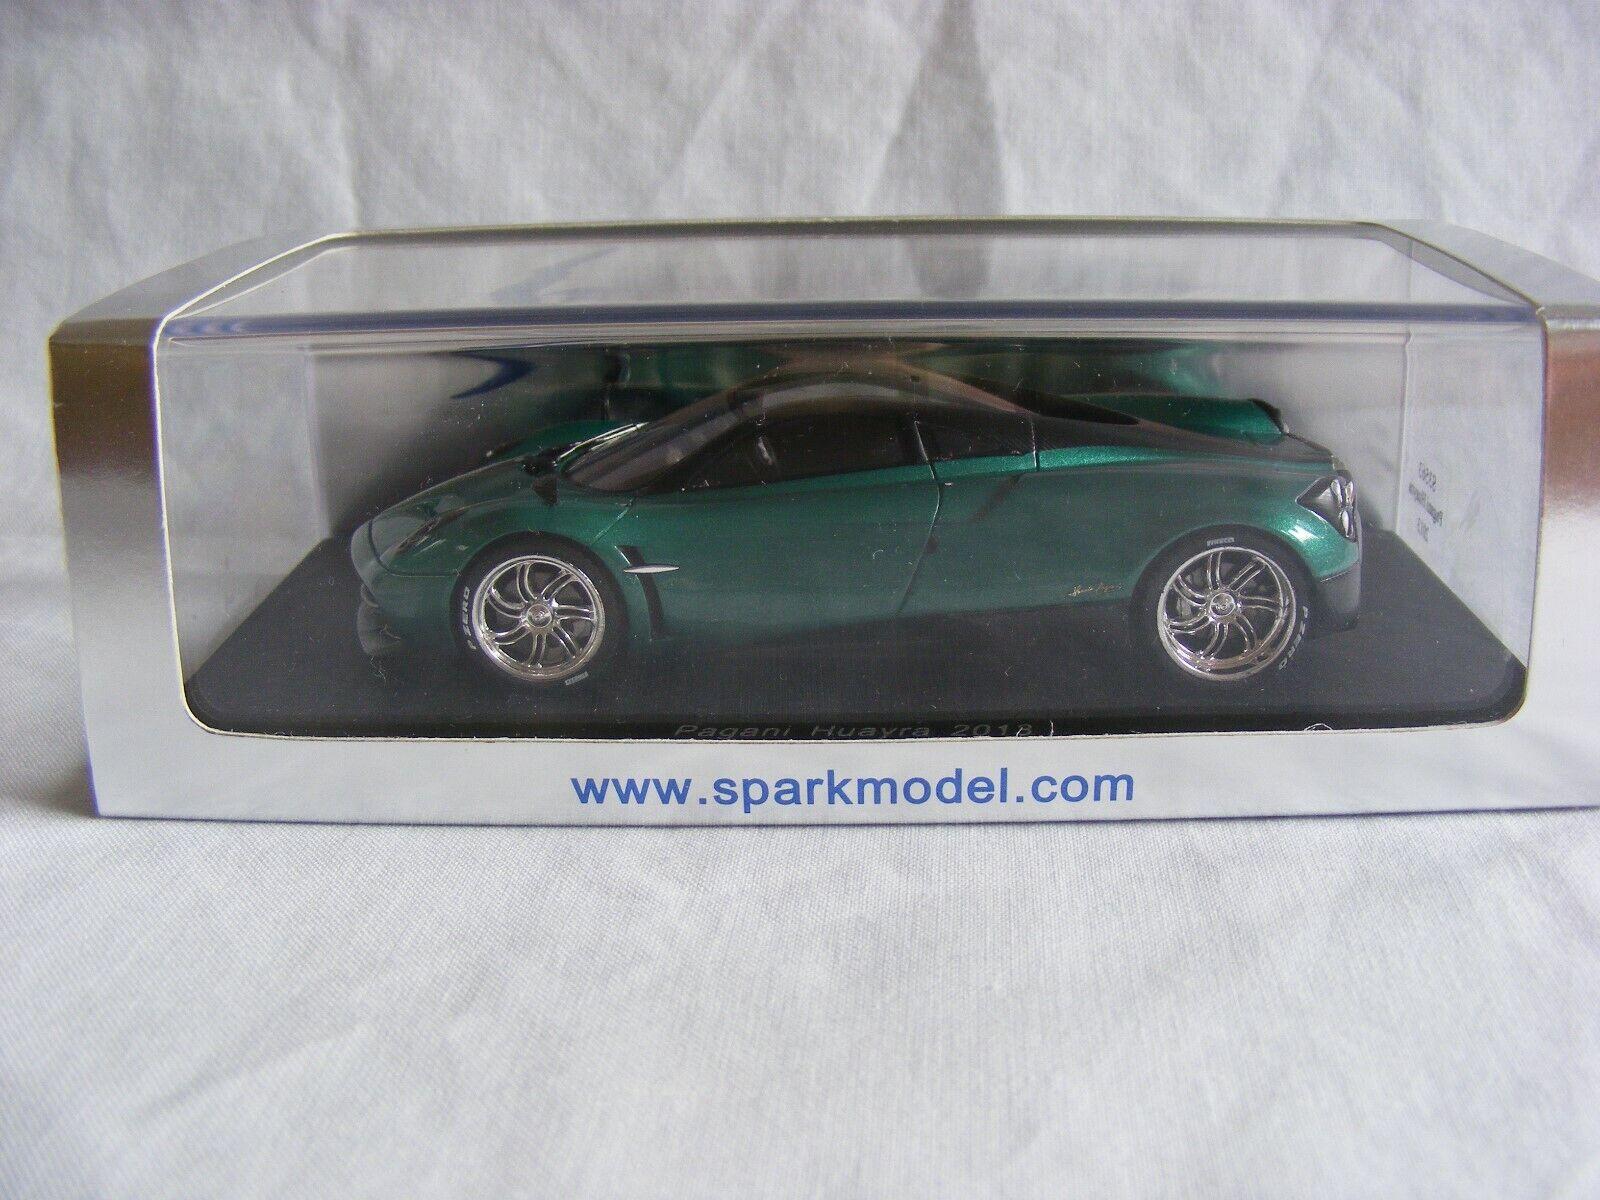 2013 PAGANI HUAYRA RHD - 1 43 Scale-SPARK-NEUF